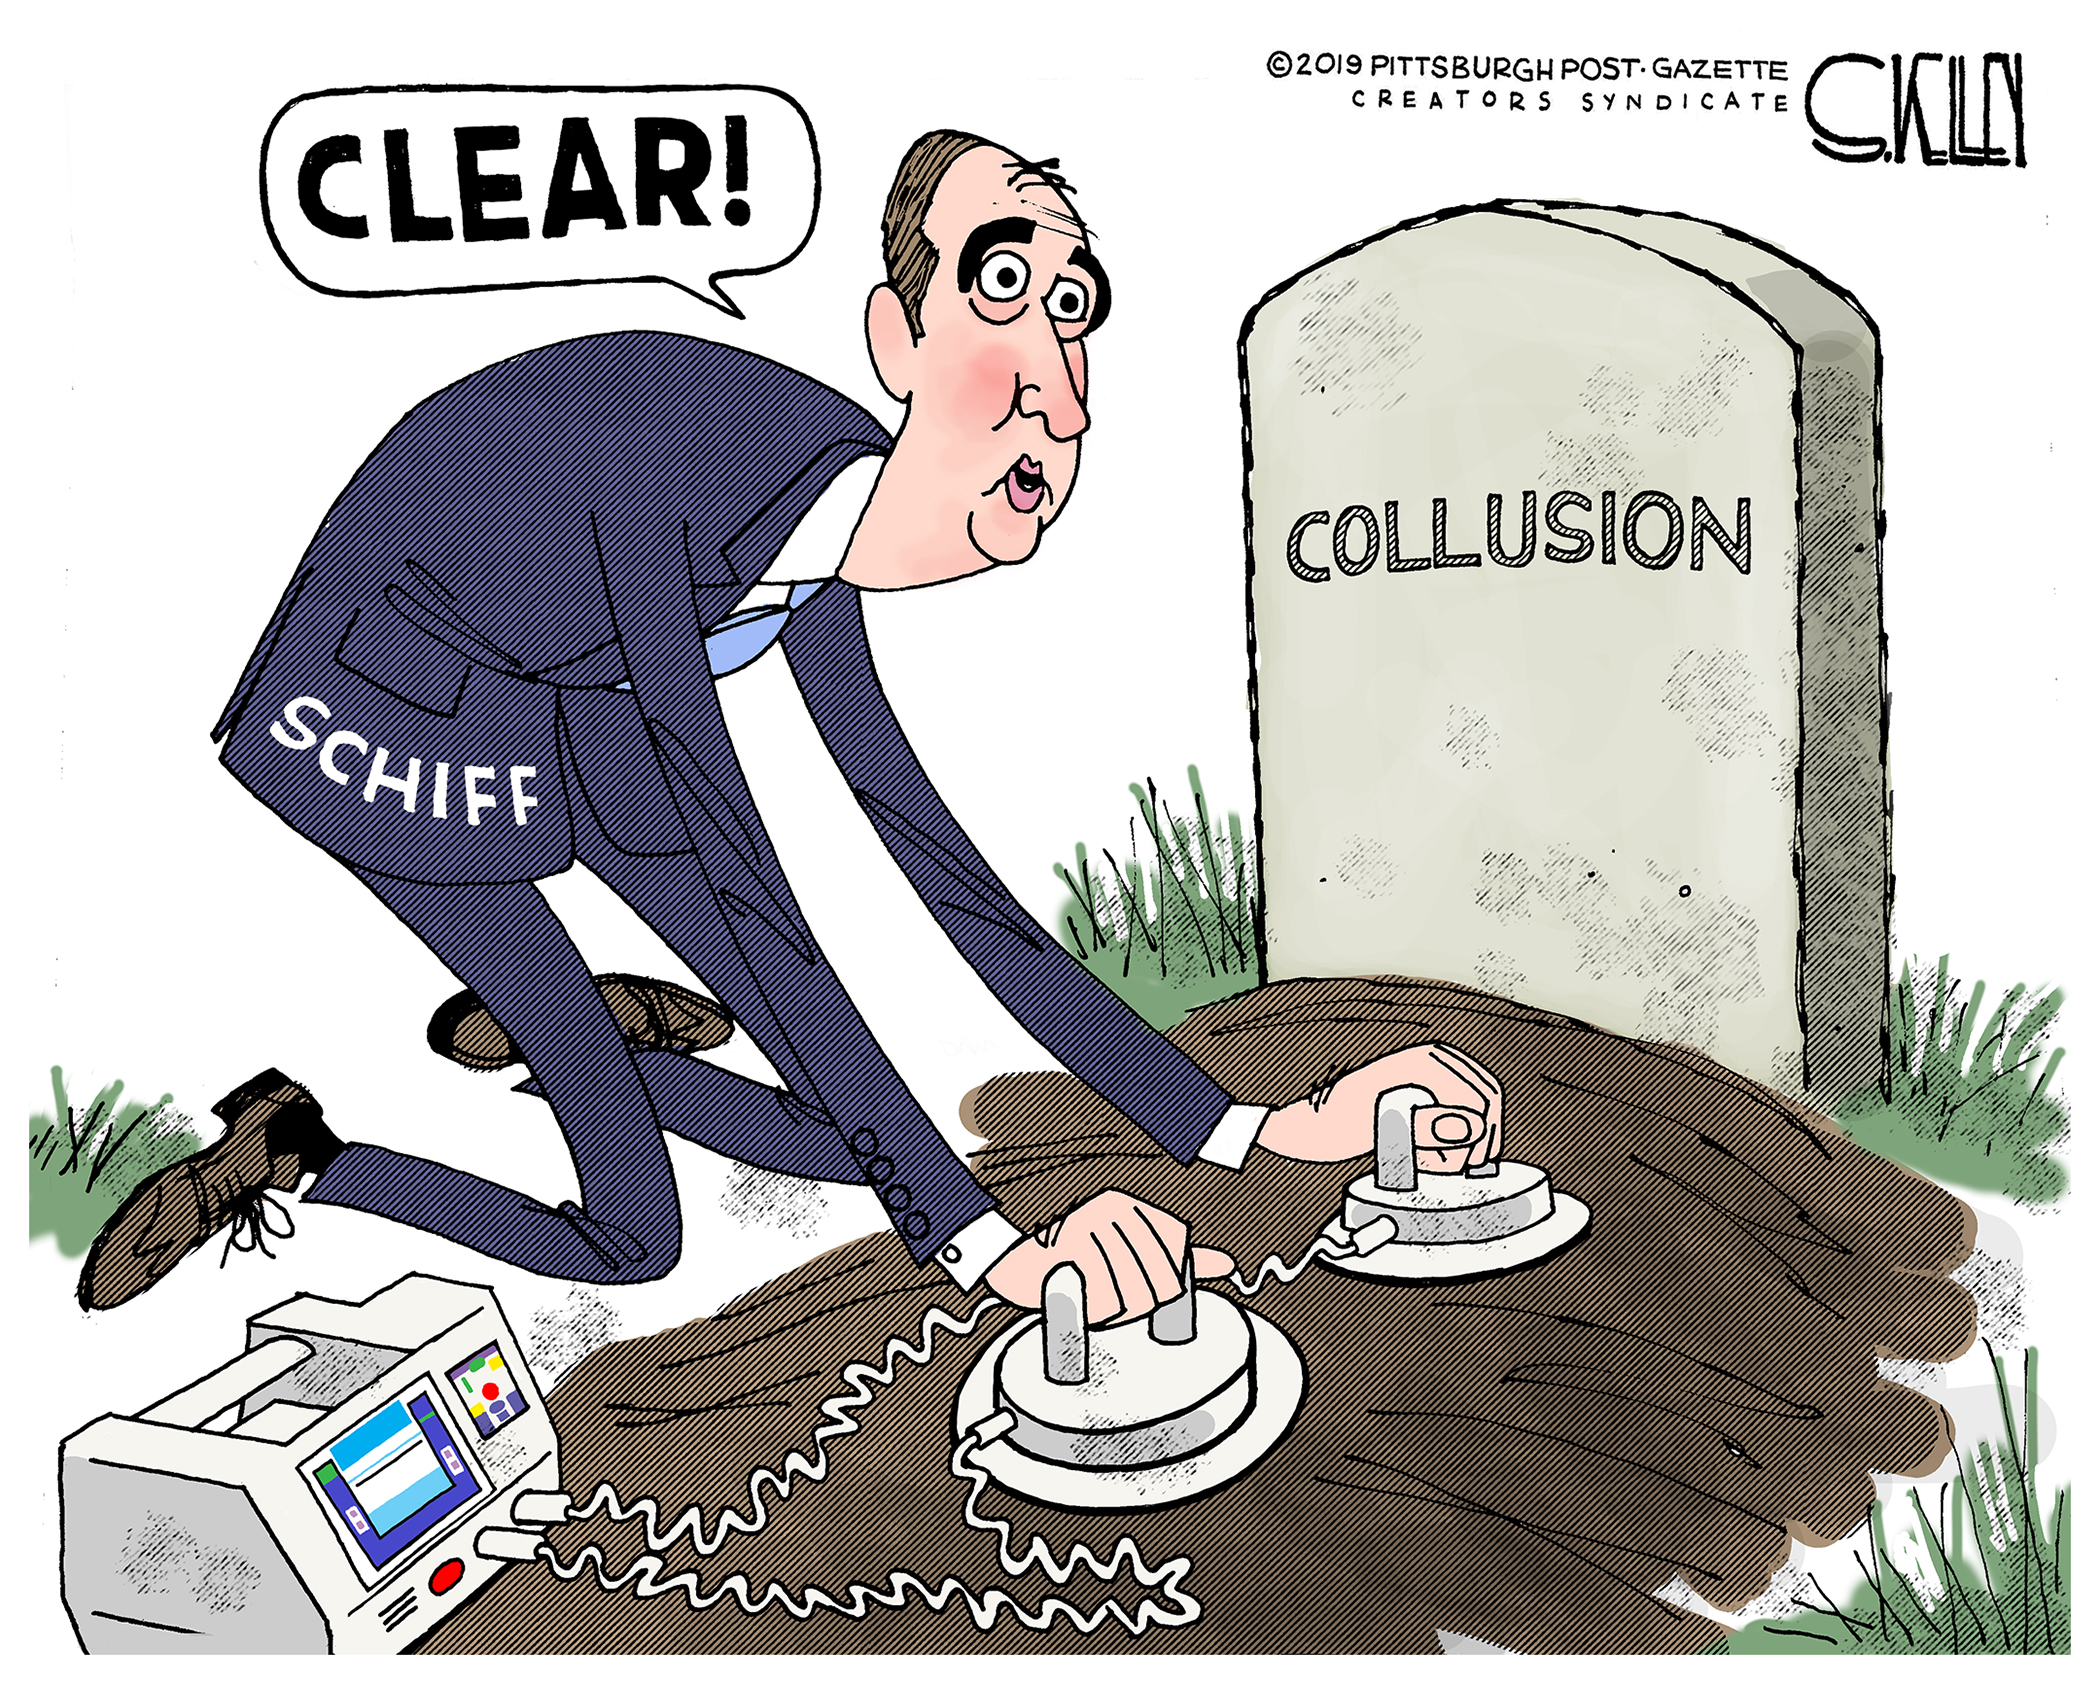 Schiff Cartoon 7-10-19